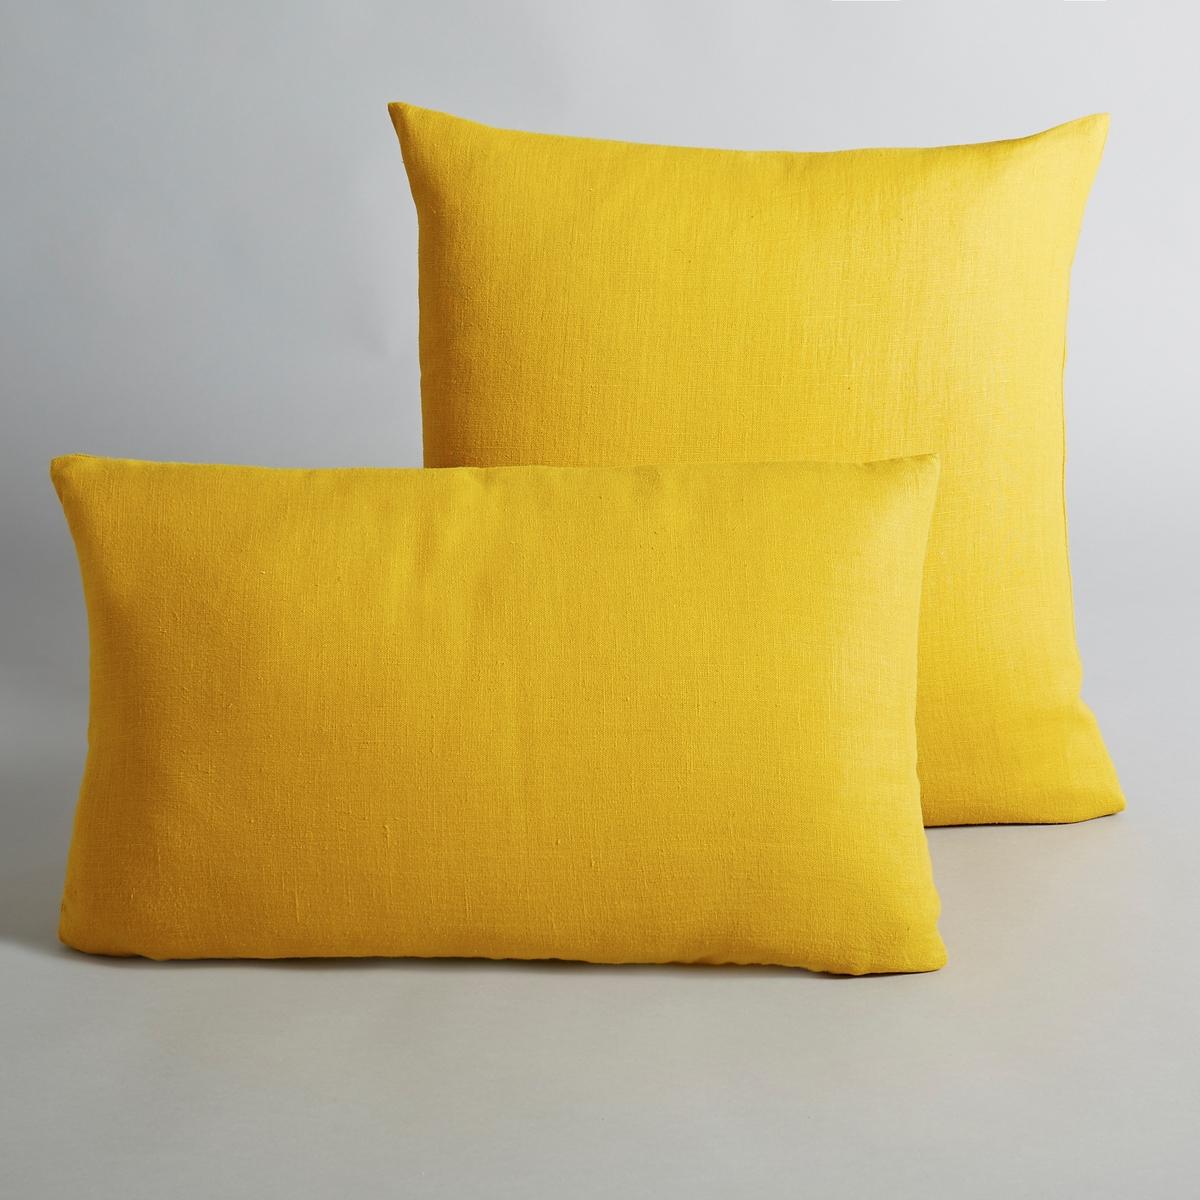 Льняной La Redoute Чехол для подушки Georgette 50 x 30 см желтый чехол la redoute для подушки fordell 50 x 30 см бежевый